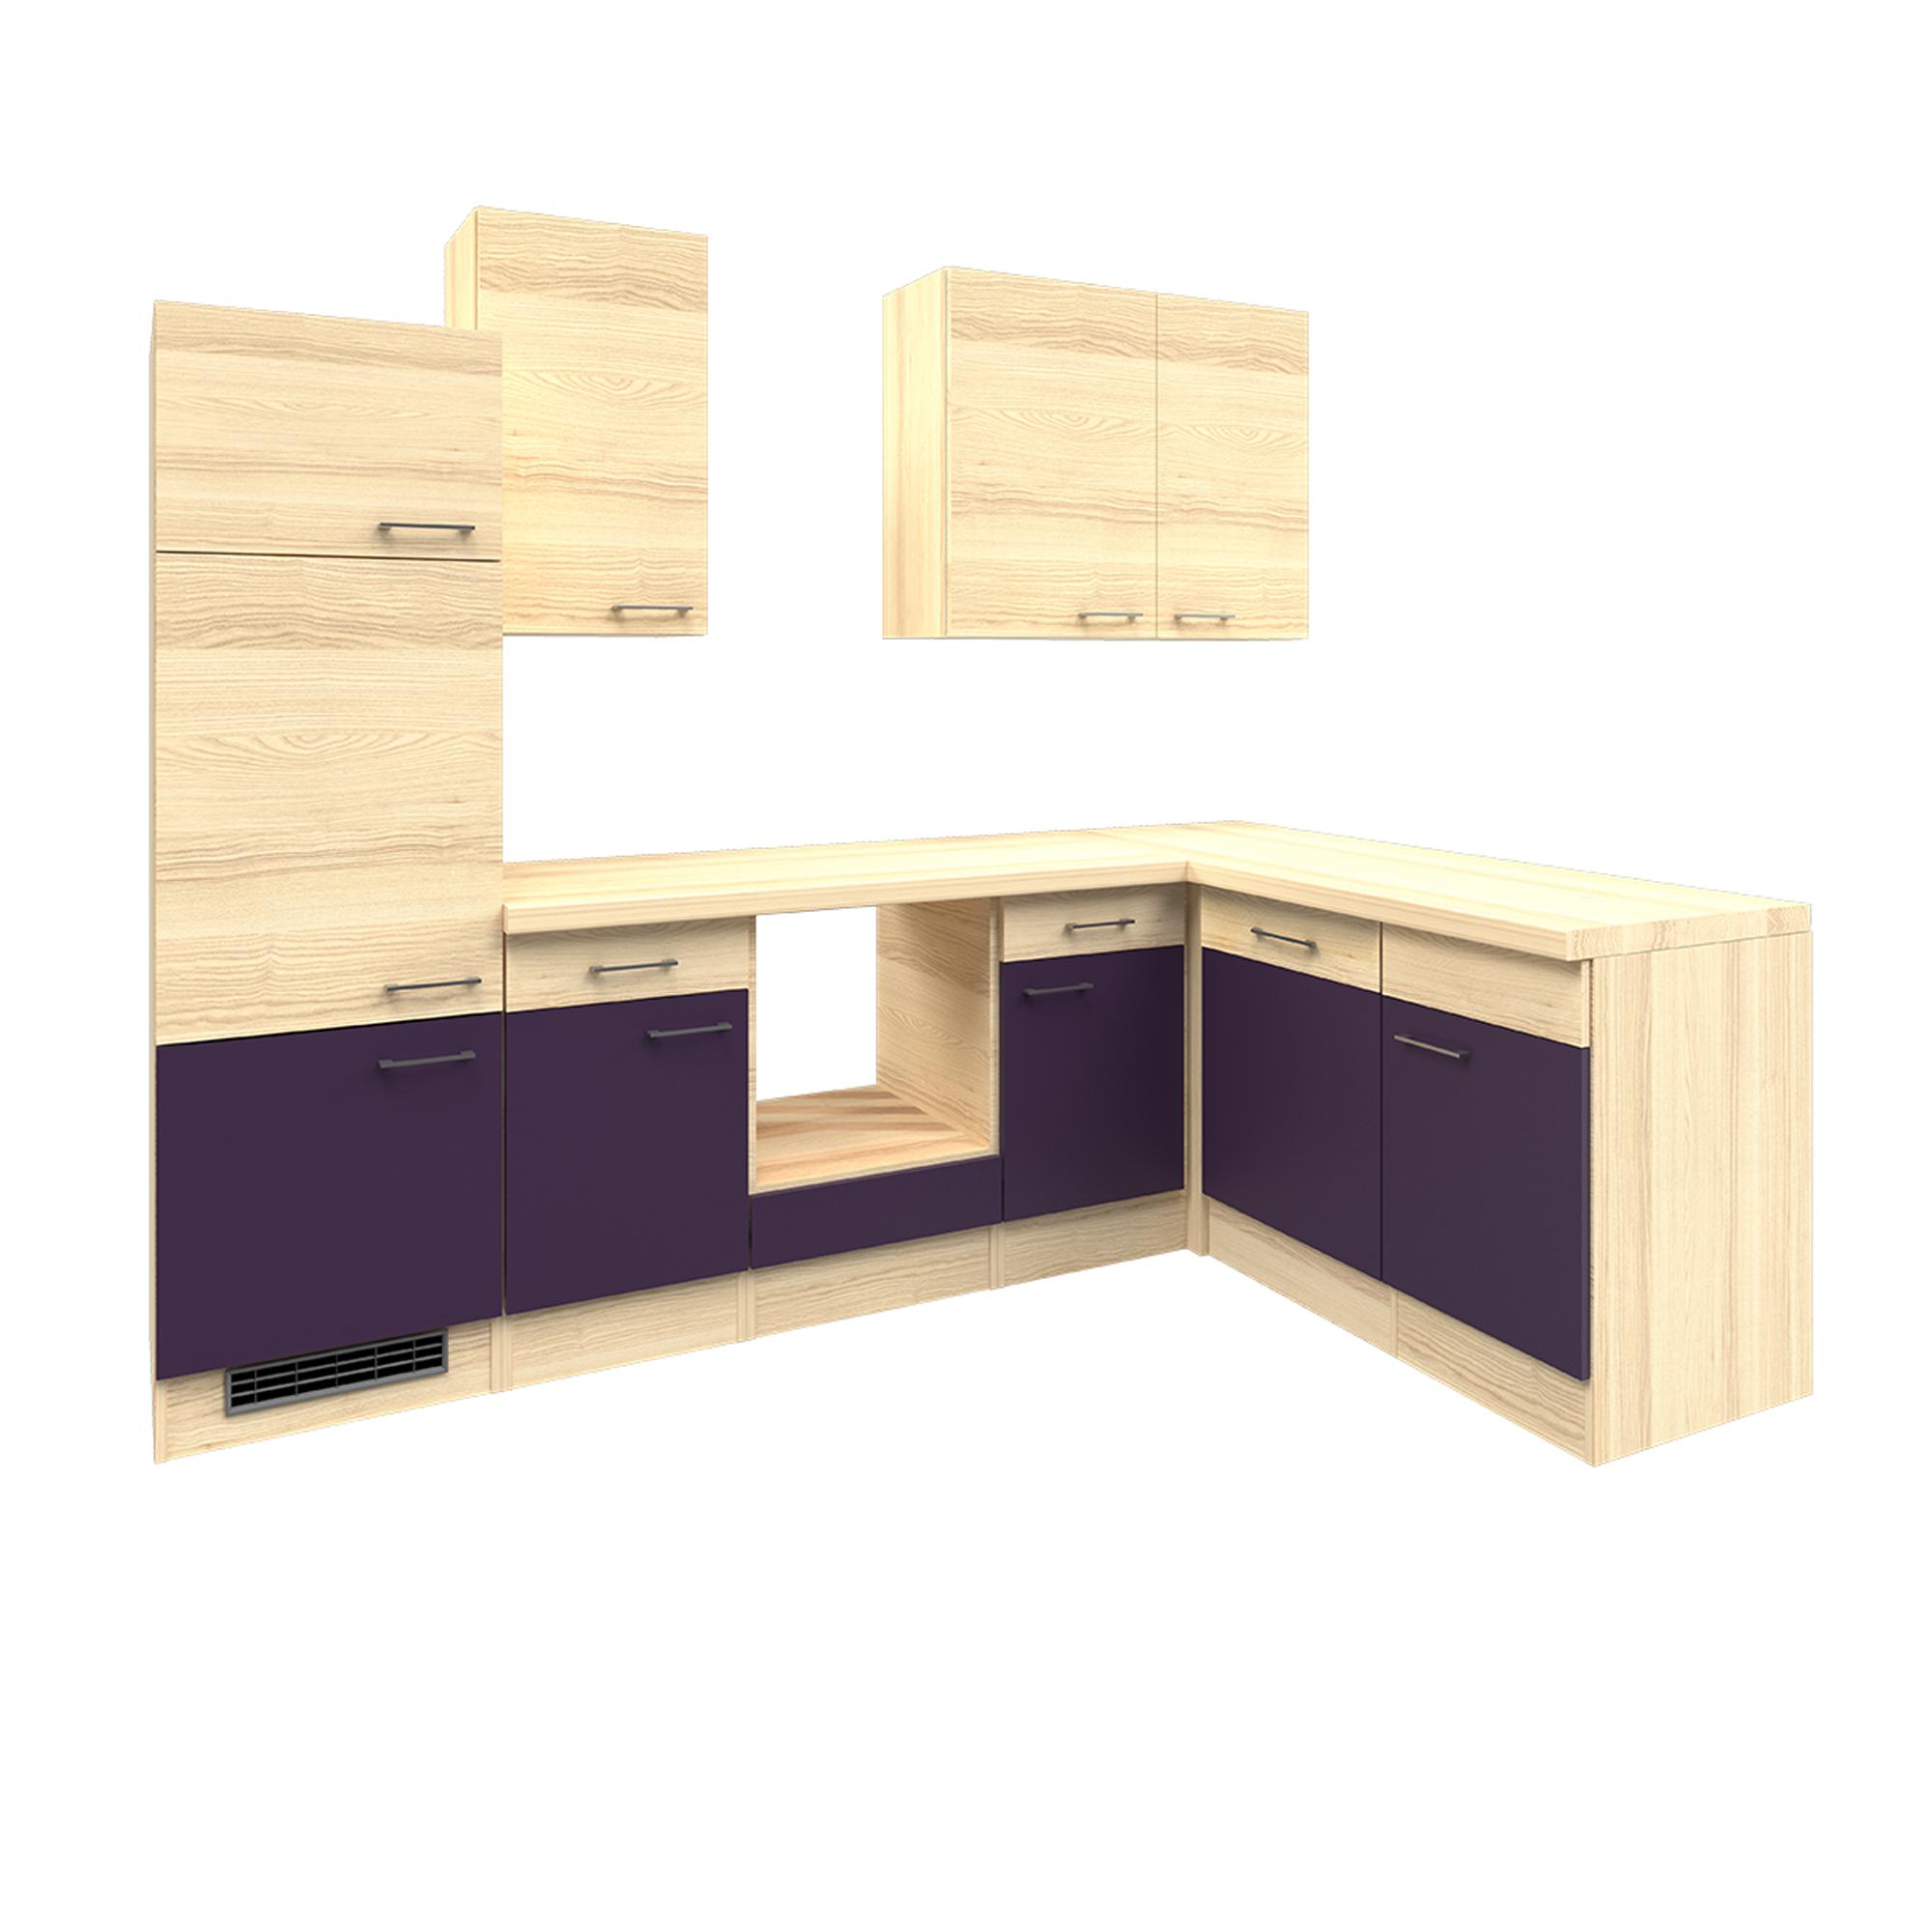 eckk che winkelk che ohne ger te k chenzeile l form einbauk che 280 x 170 cm ebay. Black Bedroom Furniture Sets. Home Design Ideas